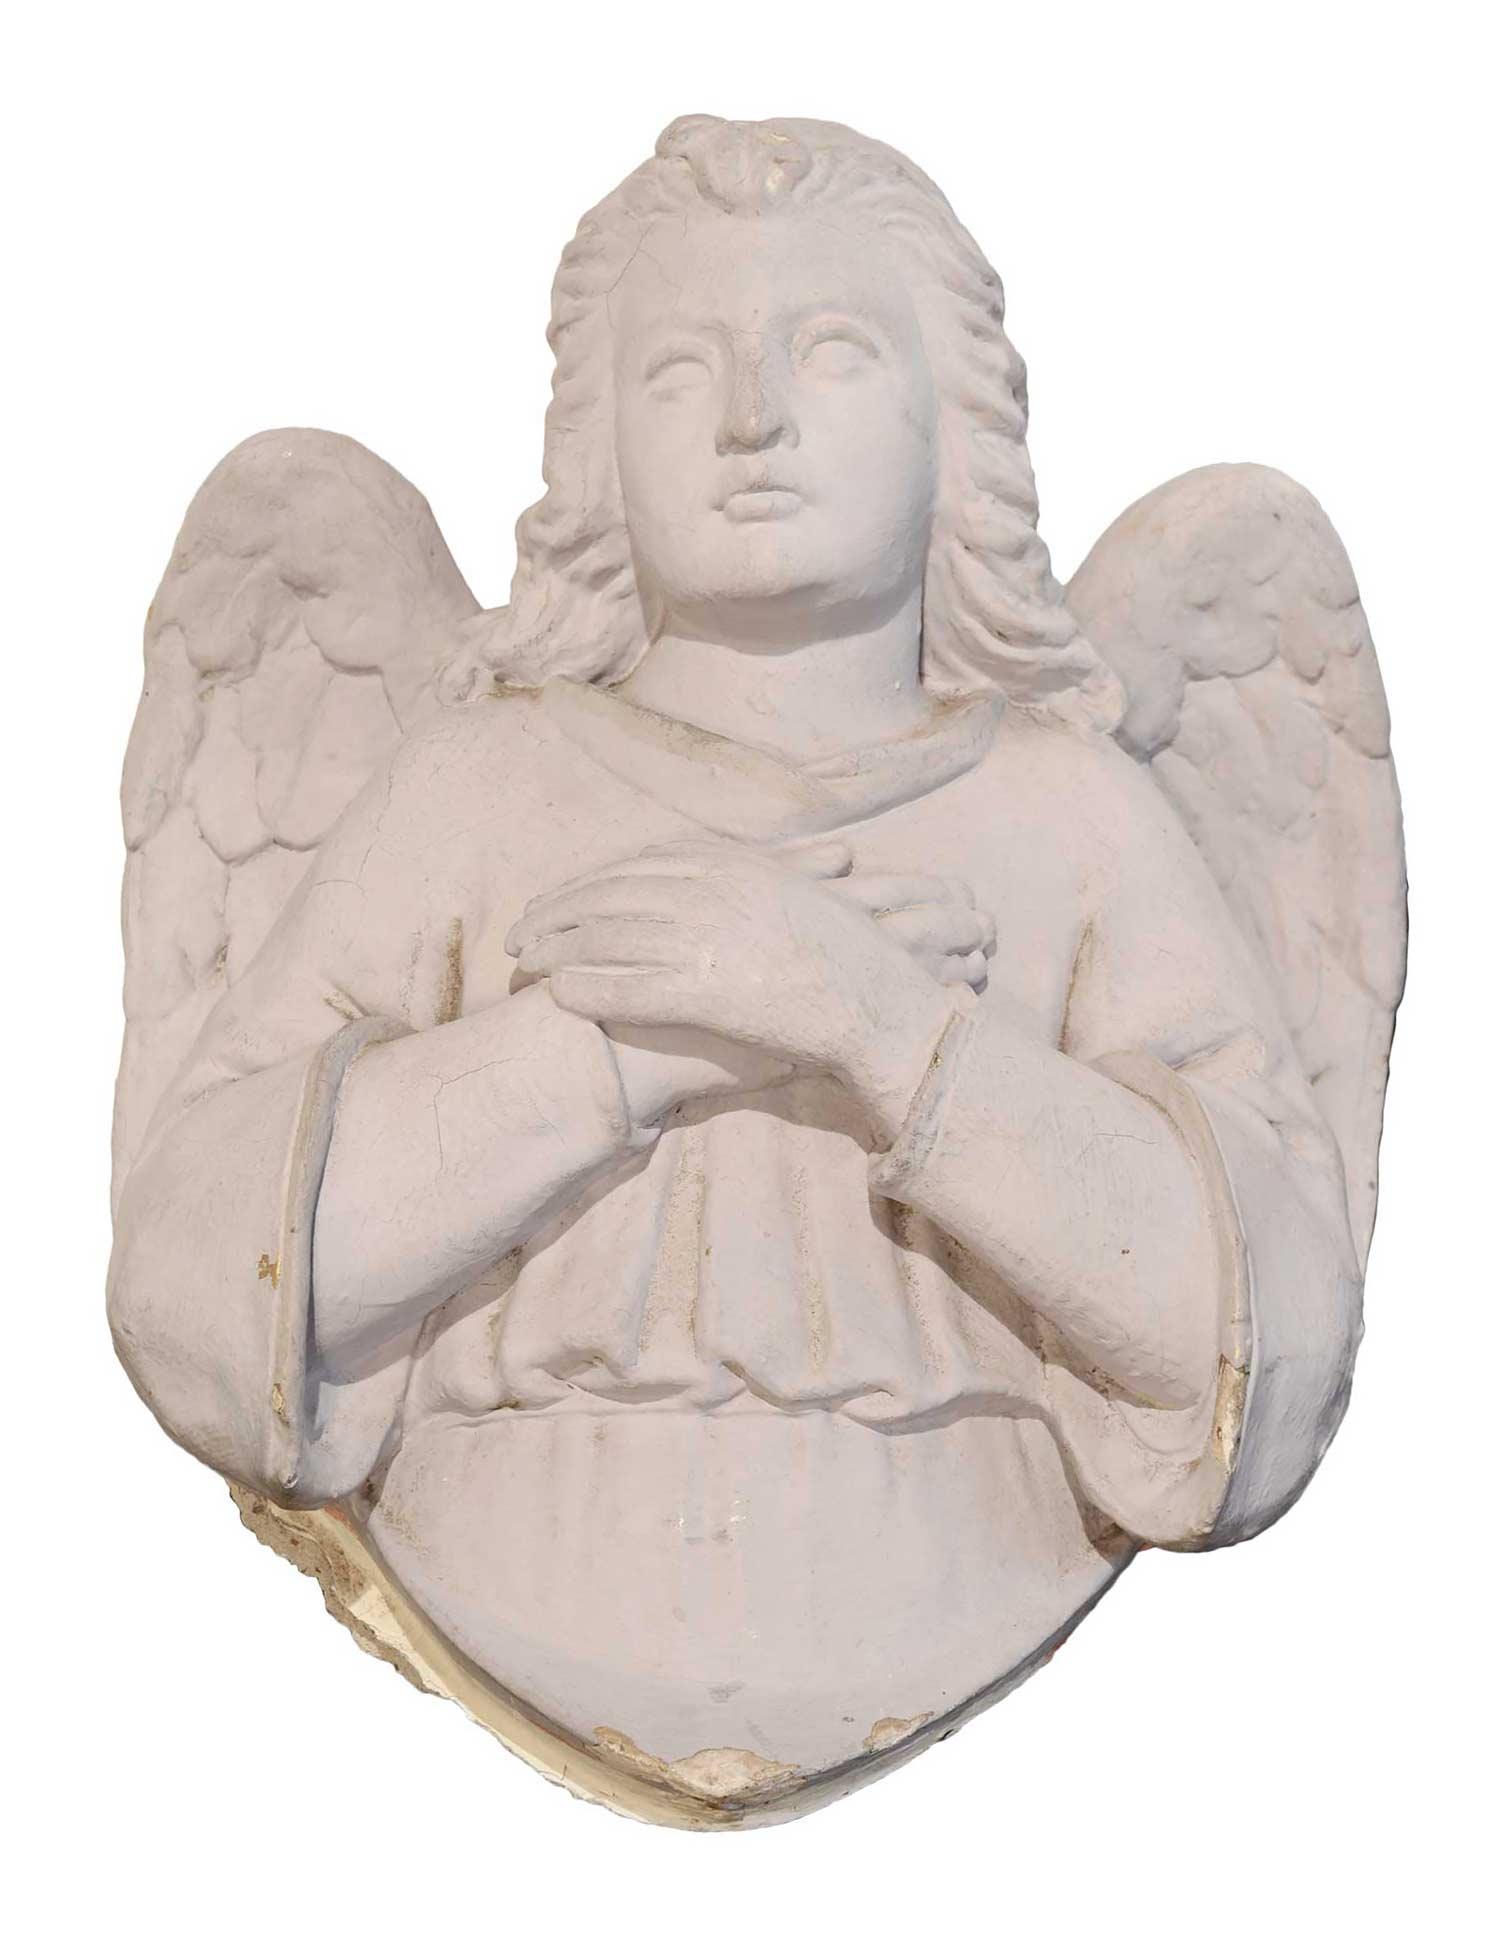 45857-angel-bust-front-2.jpg